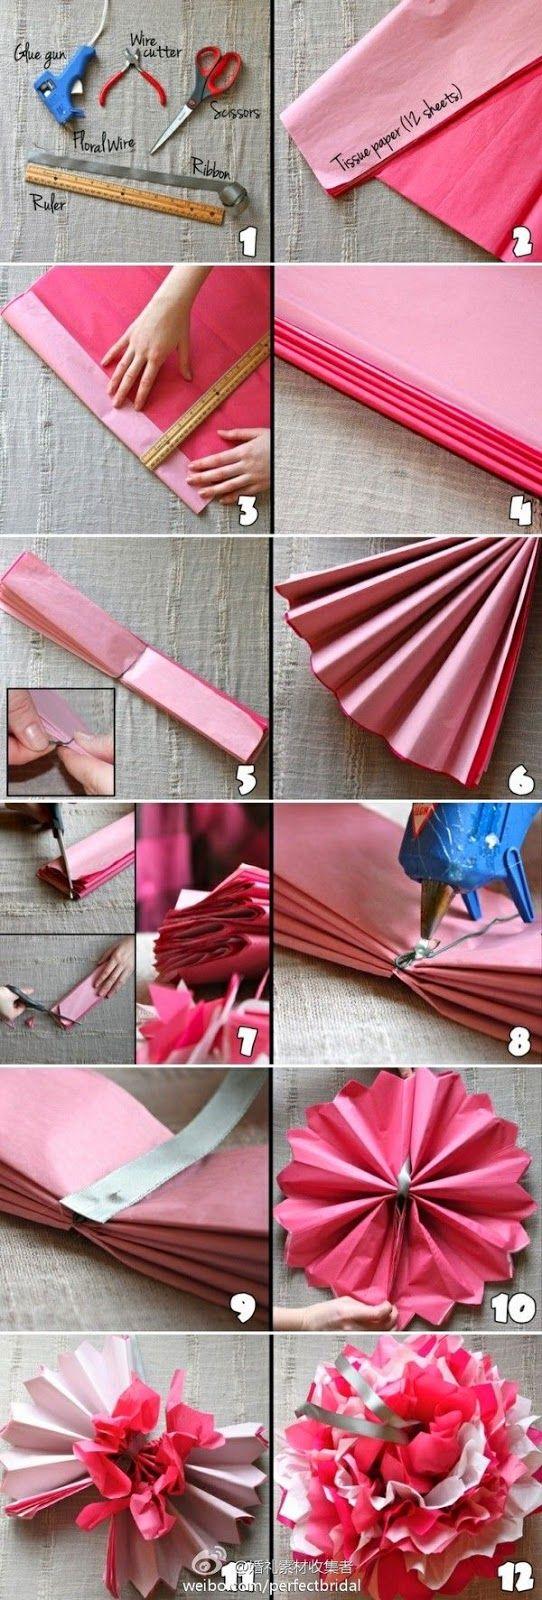 Diy easy tissue paper flower pyssla med barnen pinterest diy easy tissue paper flower solutioingenieria Image collections